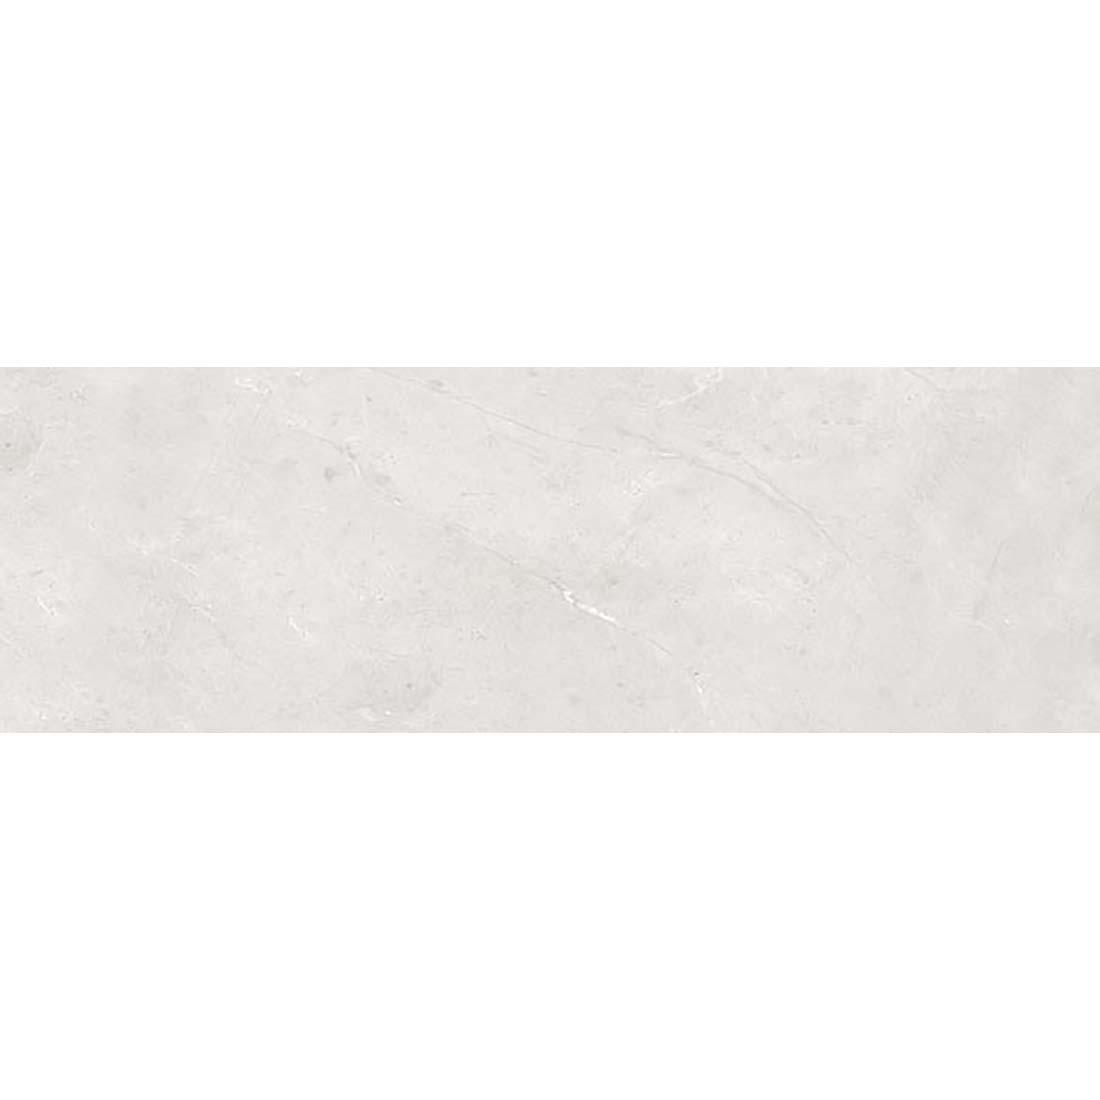 Mist 20x60 Light Grey 1